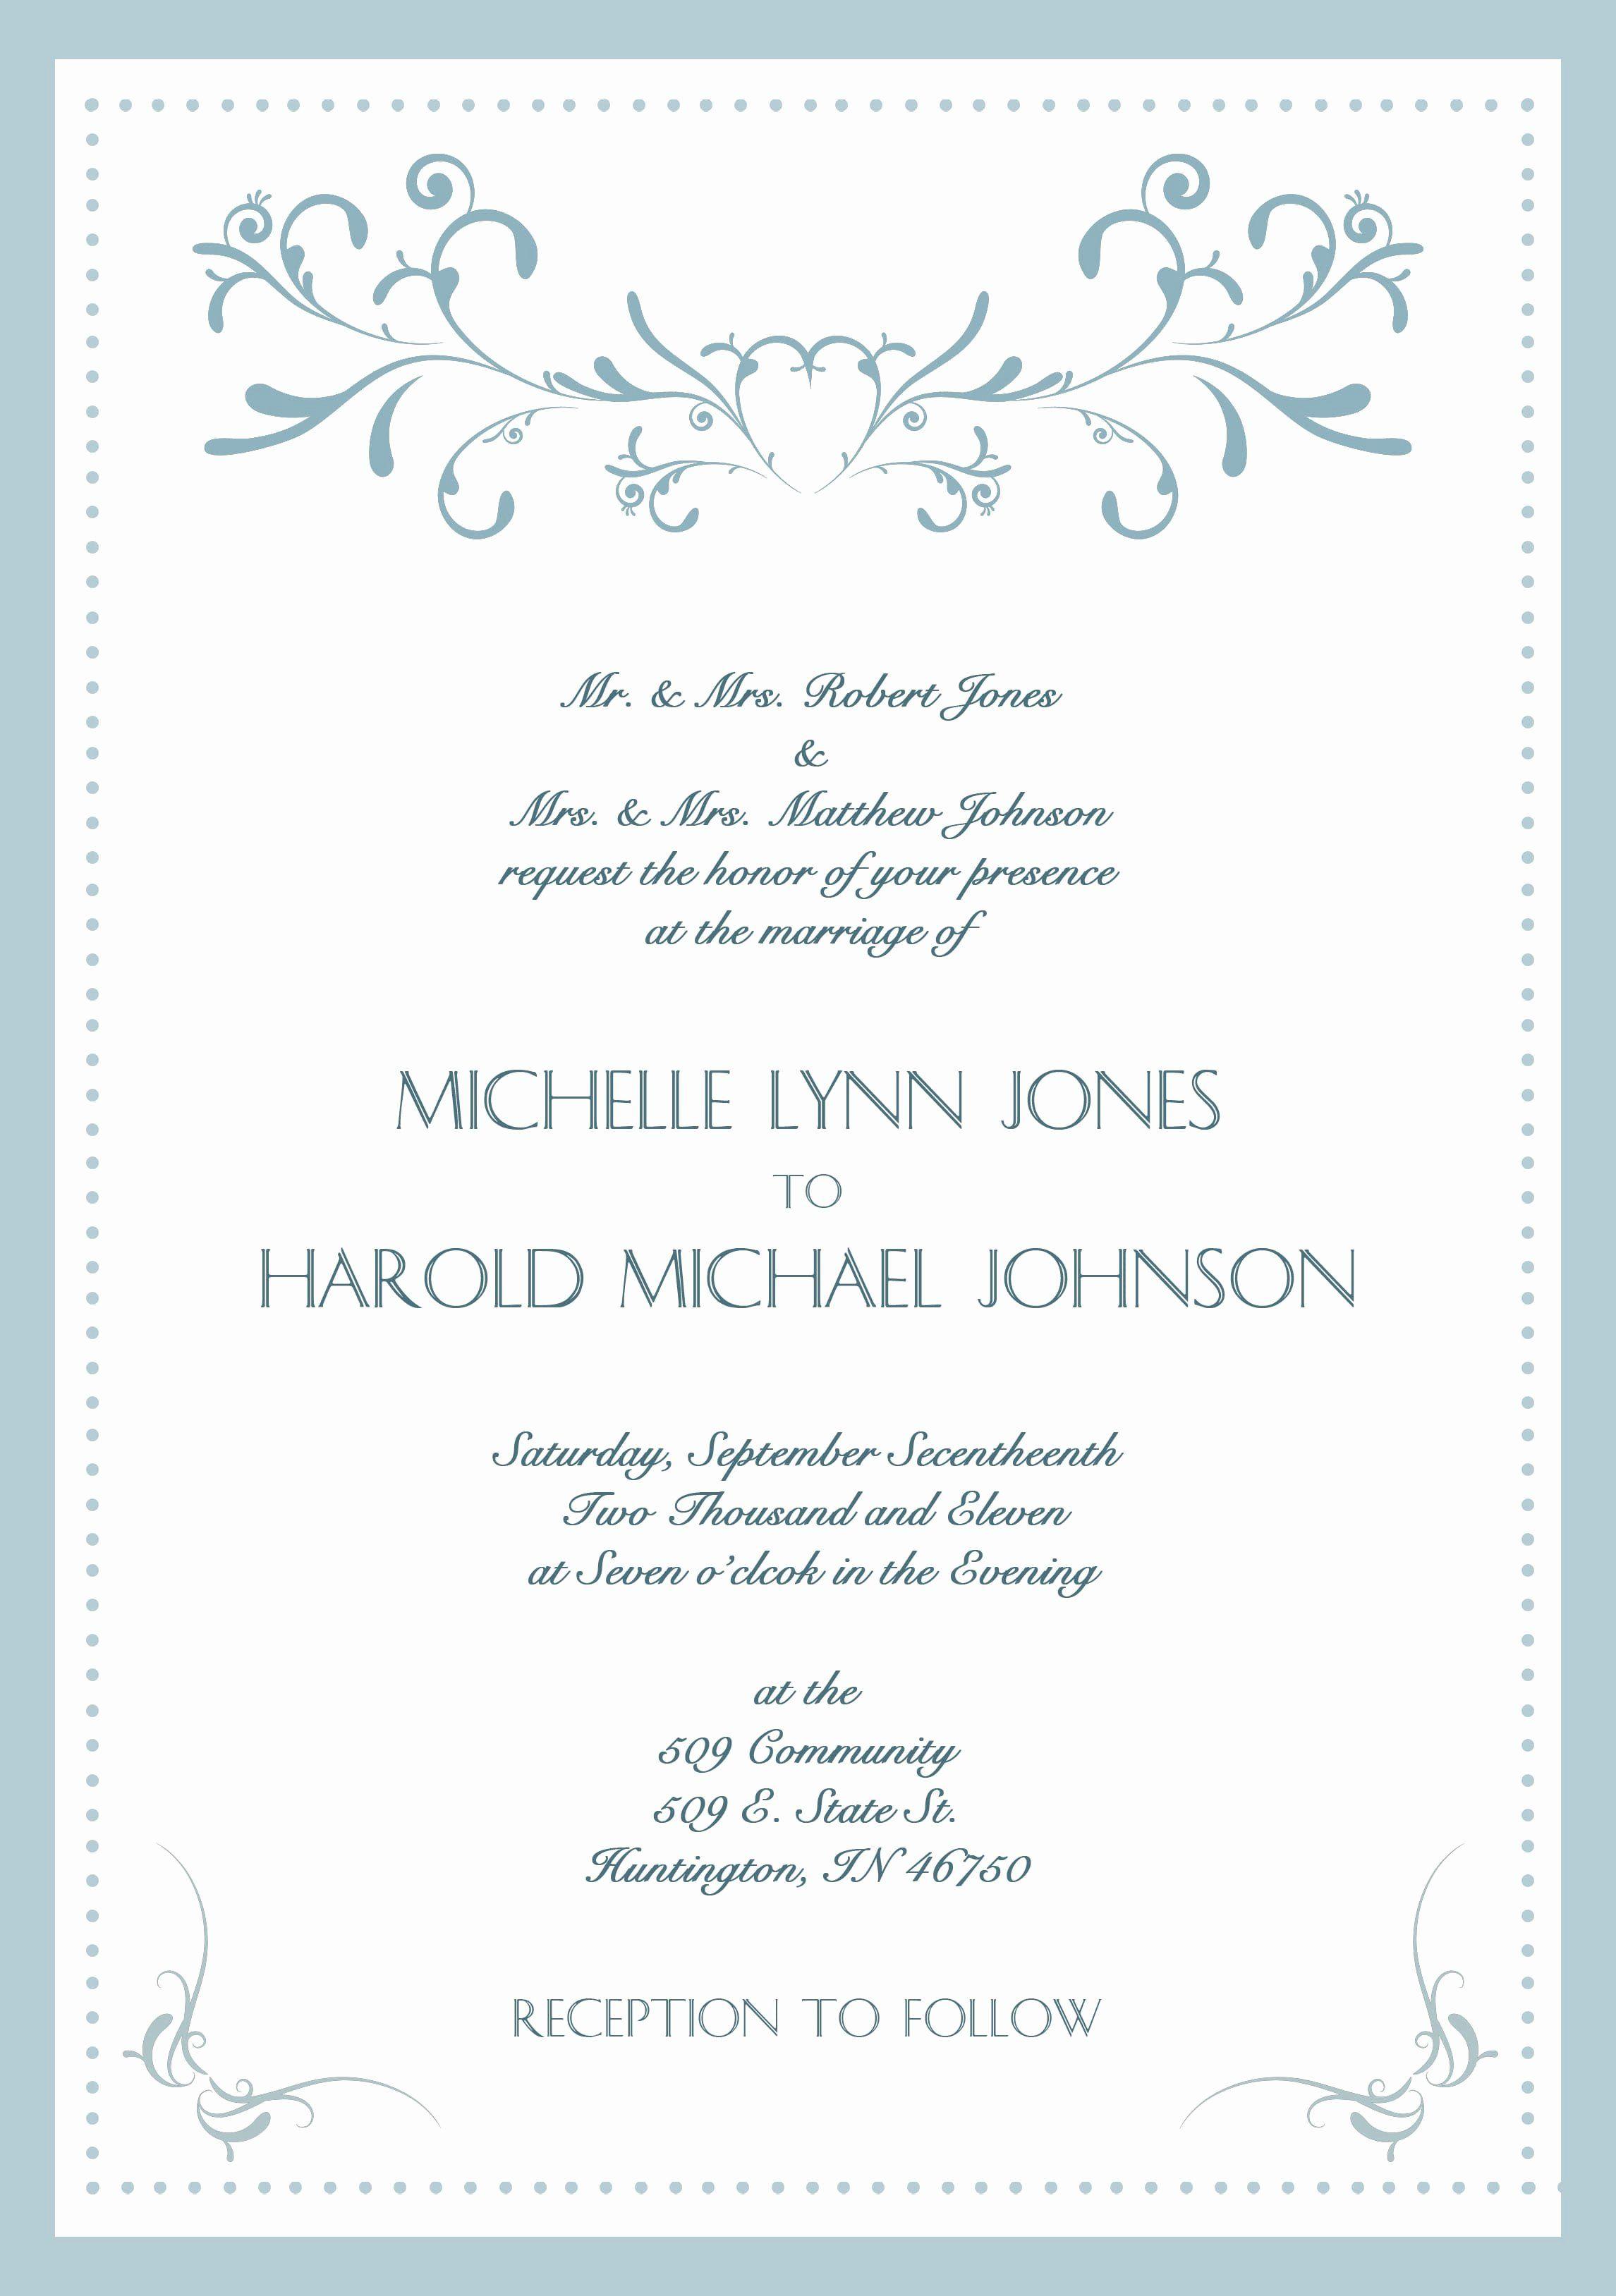 Wedding Invitations Template Word Inspirational Wedding Invita Wedding Invitation Wording Formal Wedding Invitations Examples Sample Wedding Invitation Wording